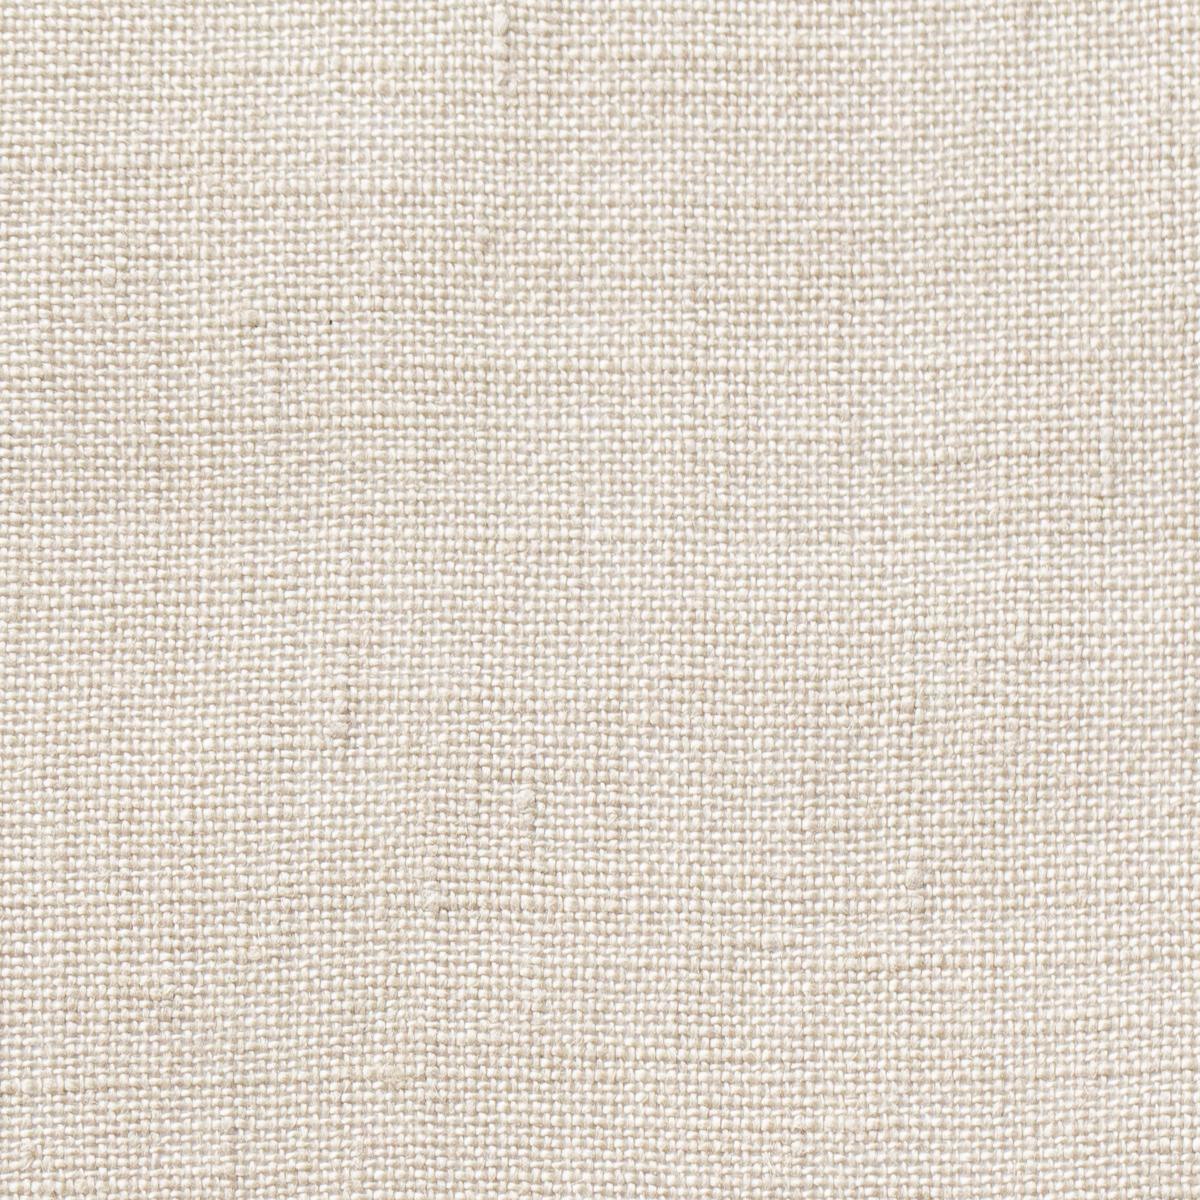 Wedding album fabric swatch sample, summer